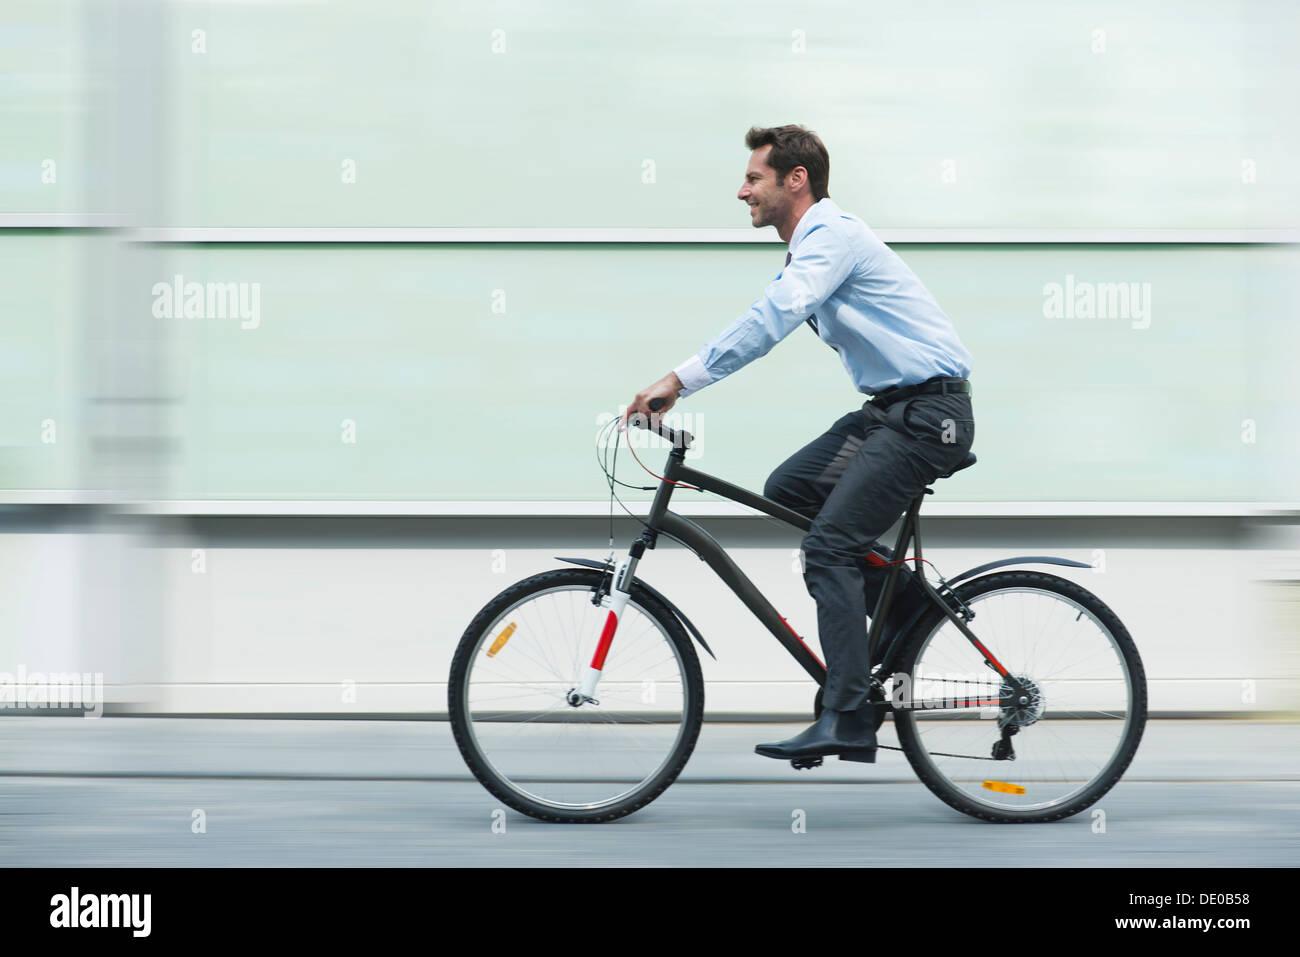 Businessman riding bicycle - Stock Image